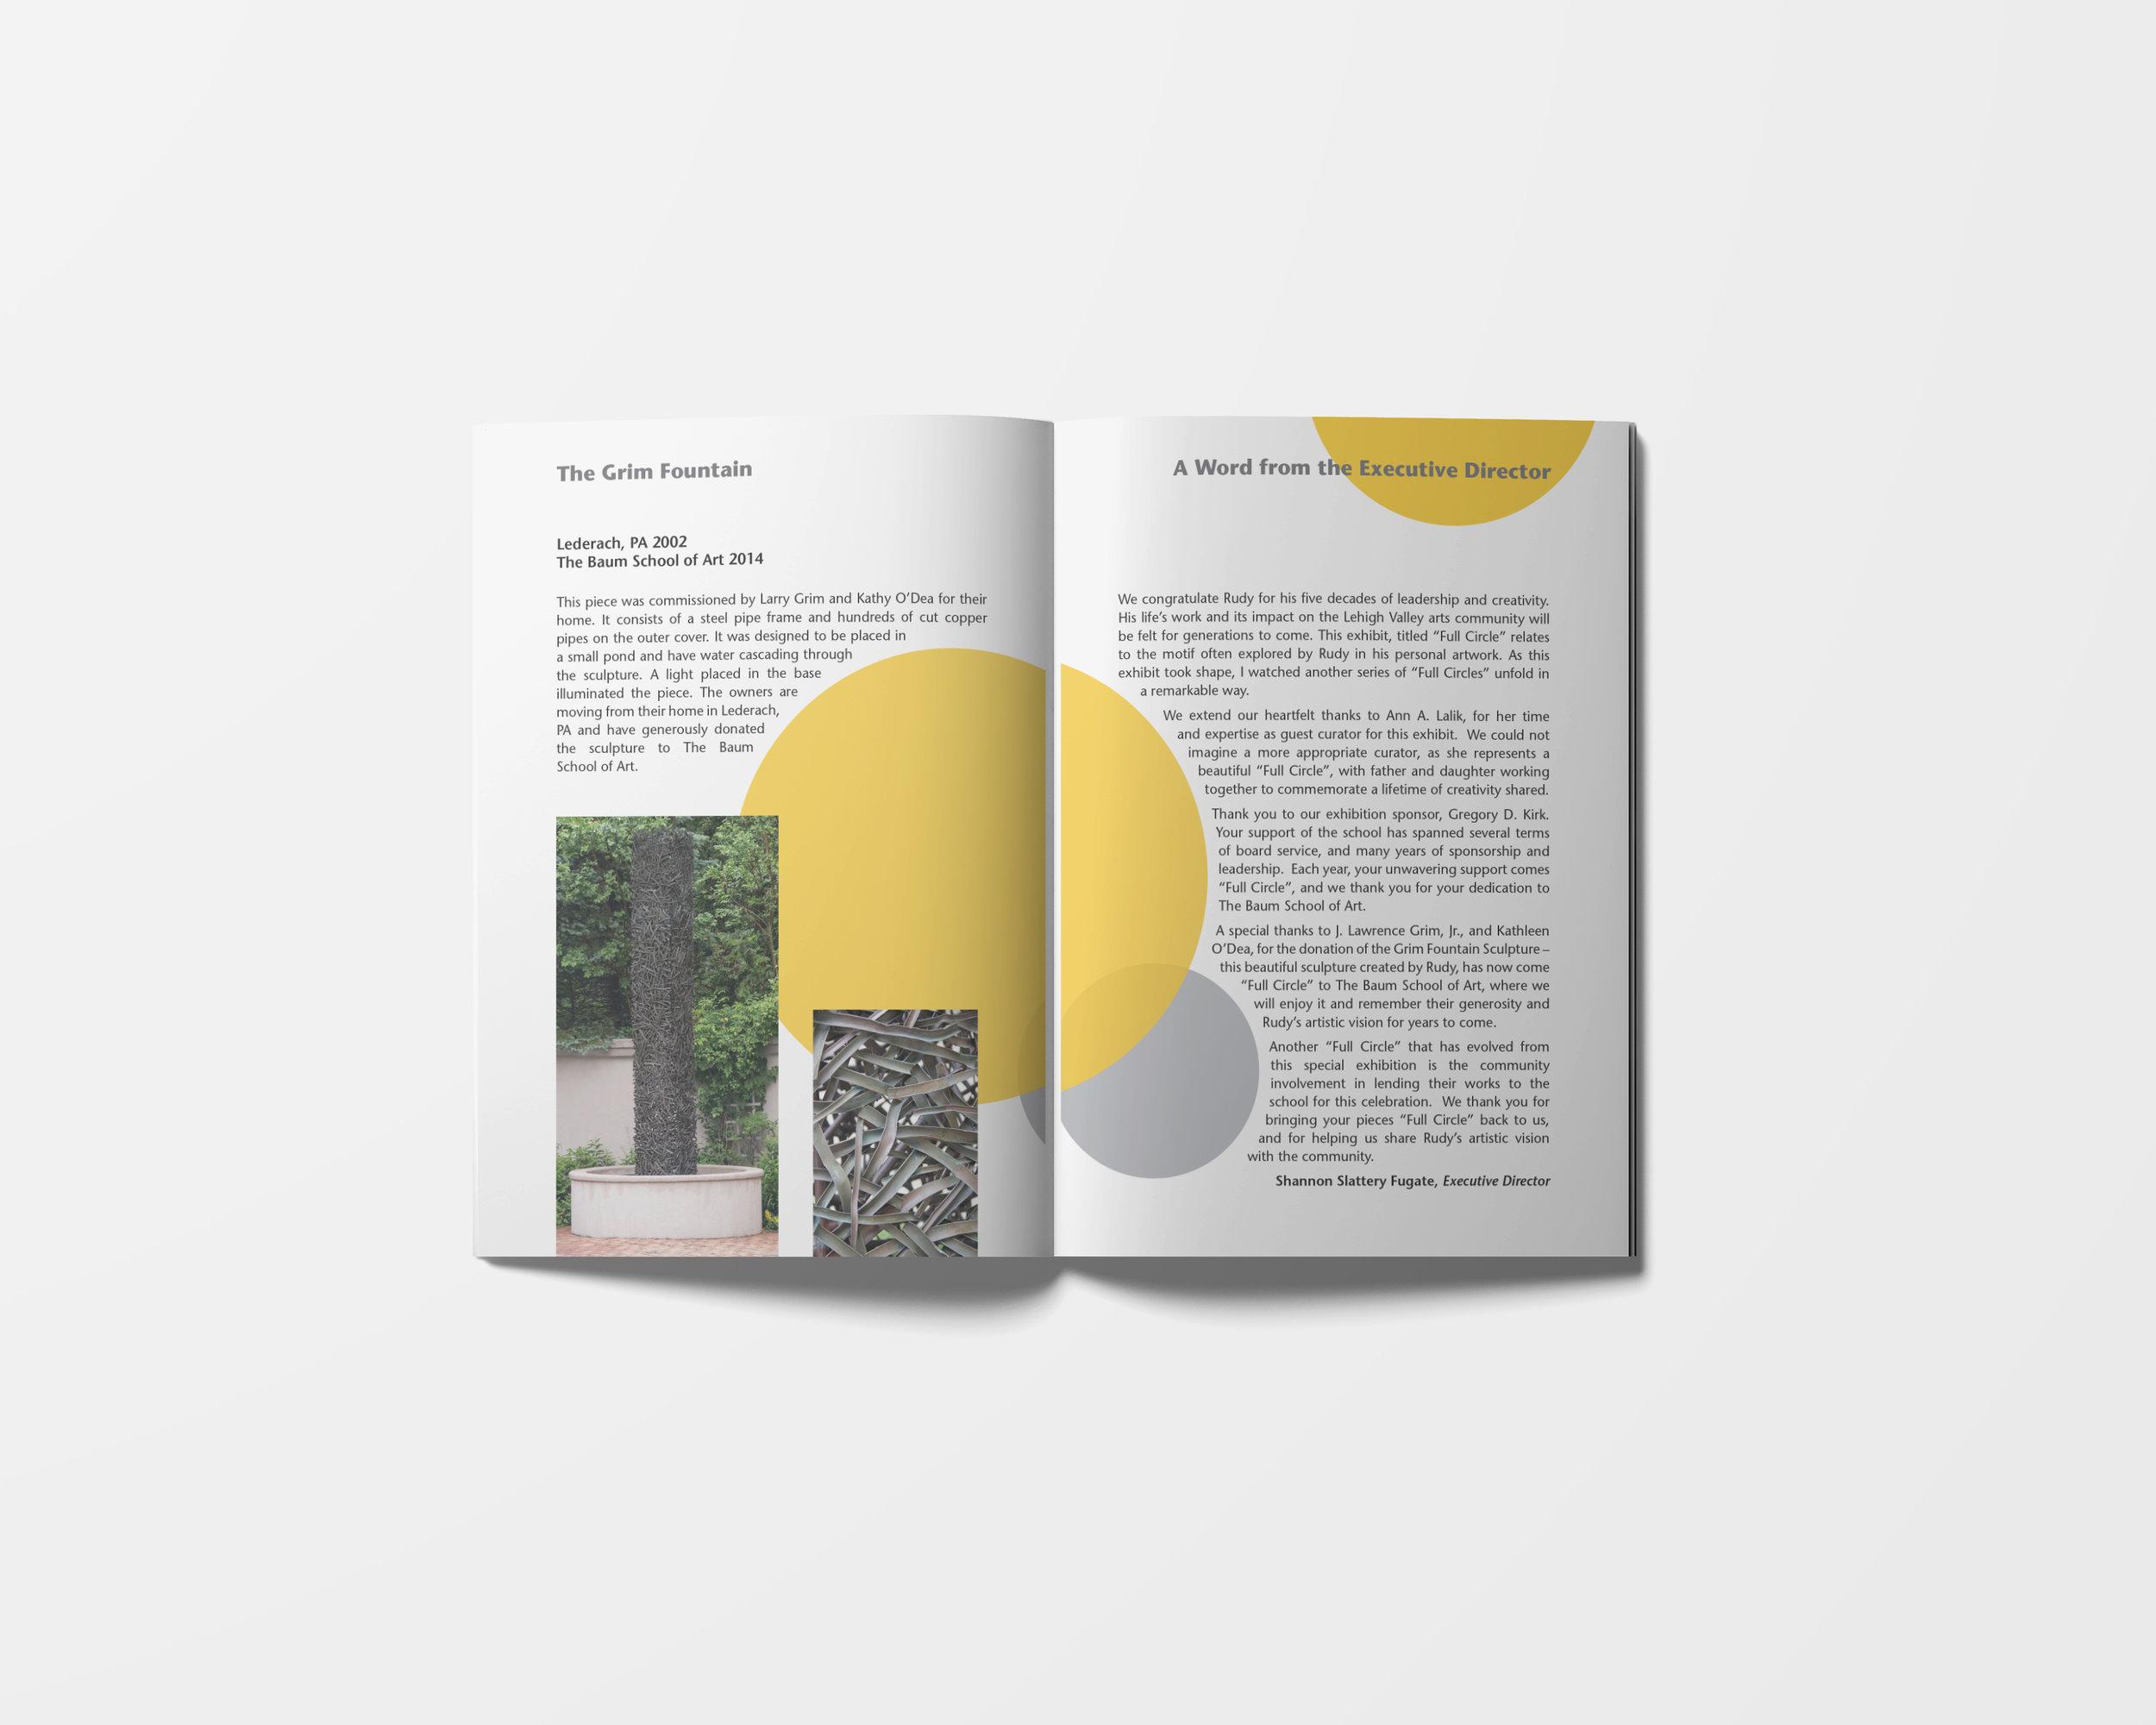 FullCircle-Booklet-Mock02.jpg